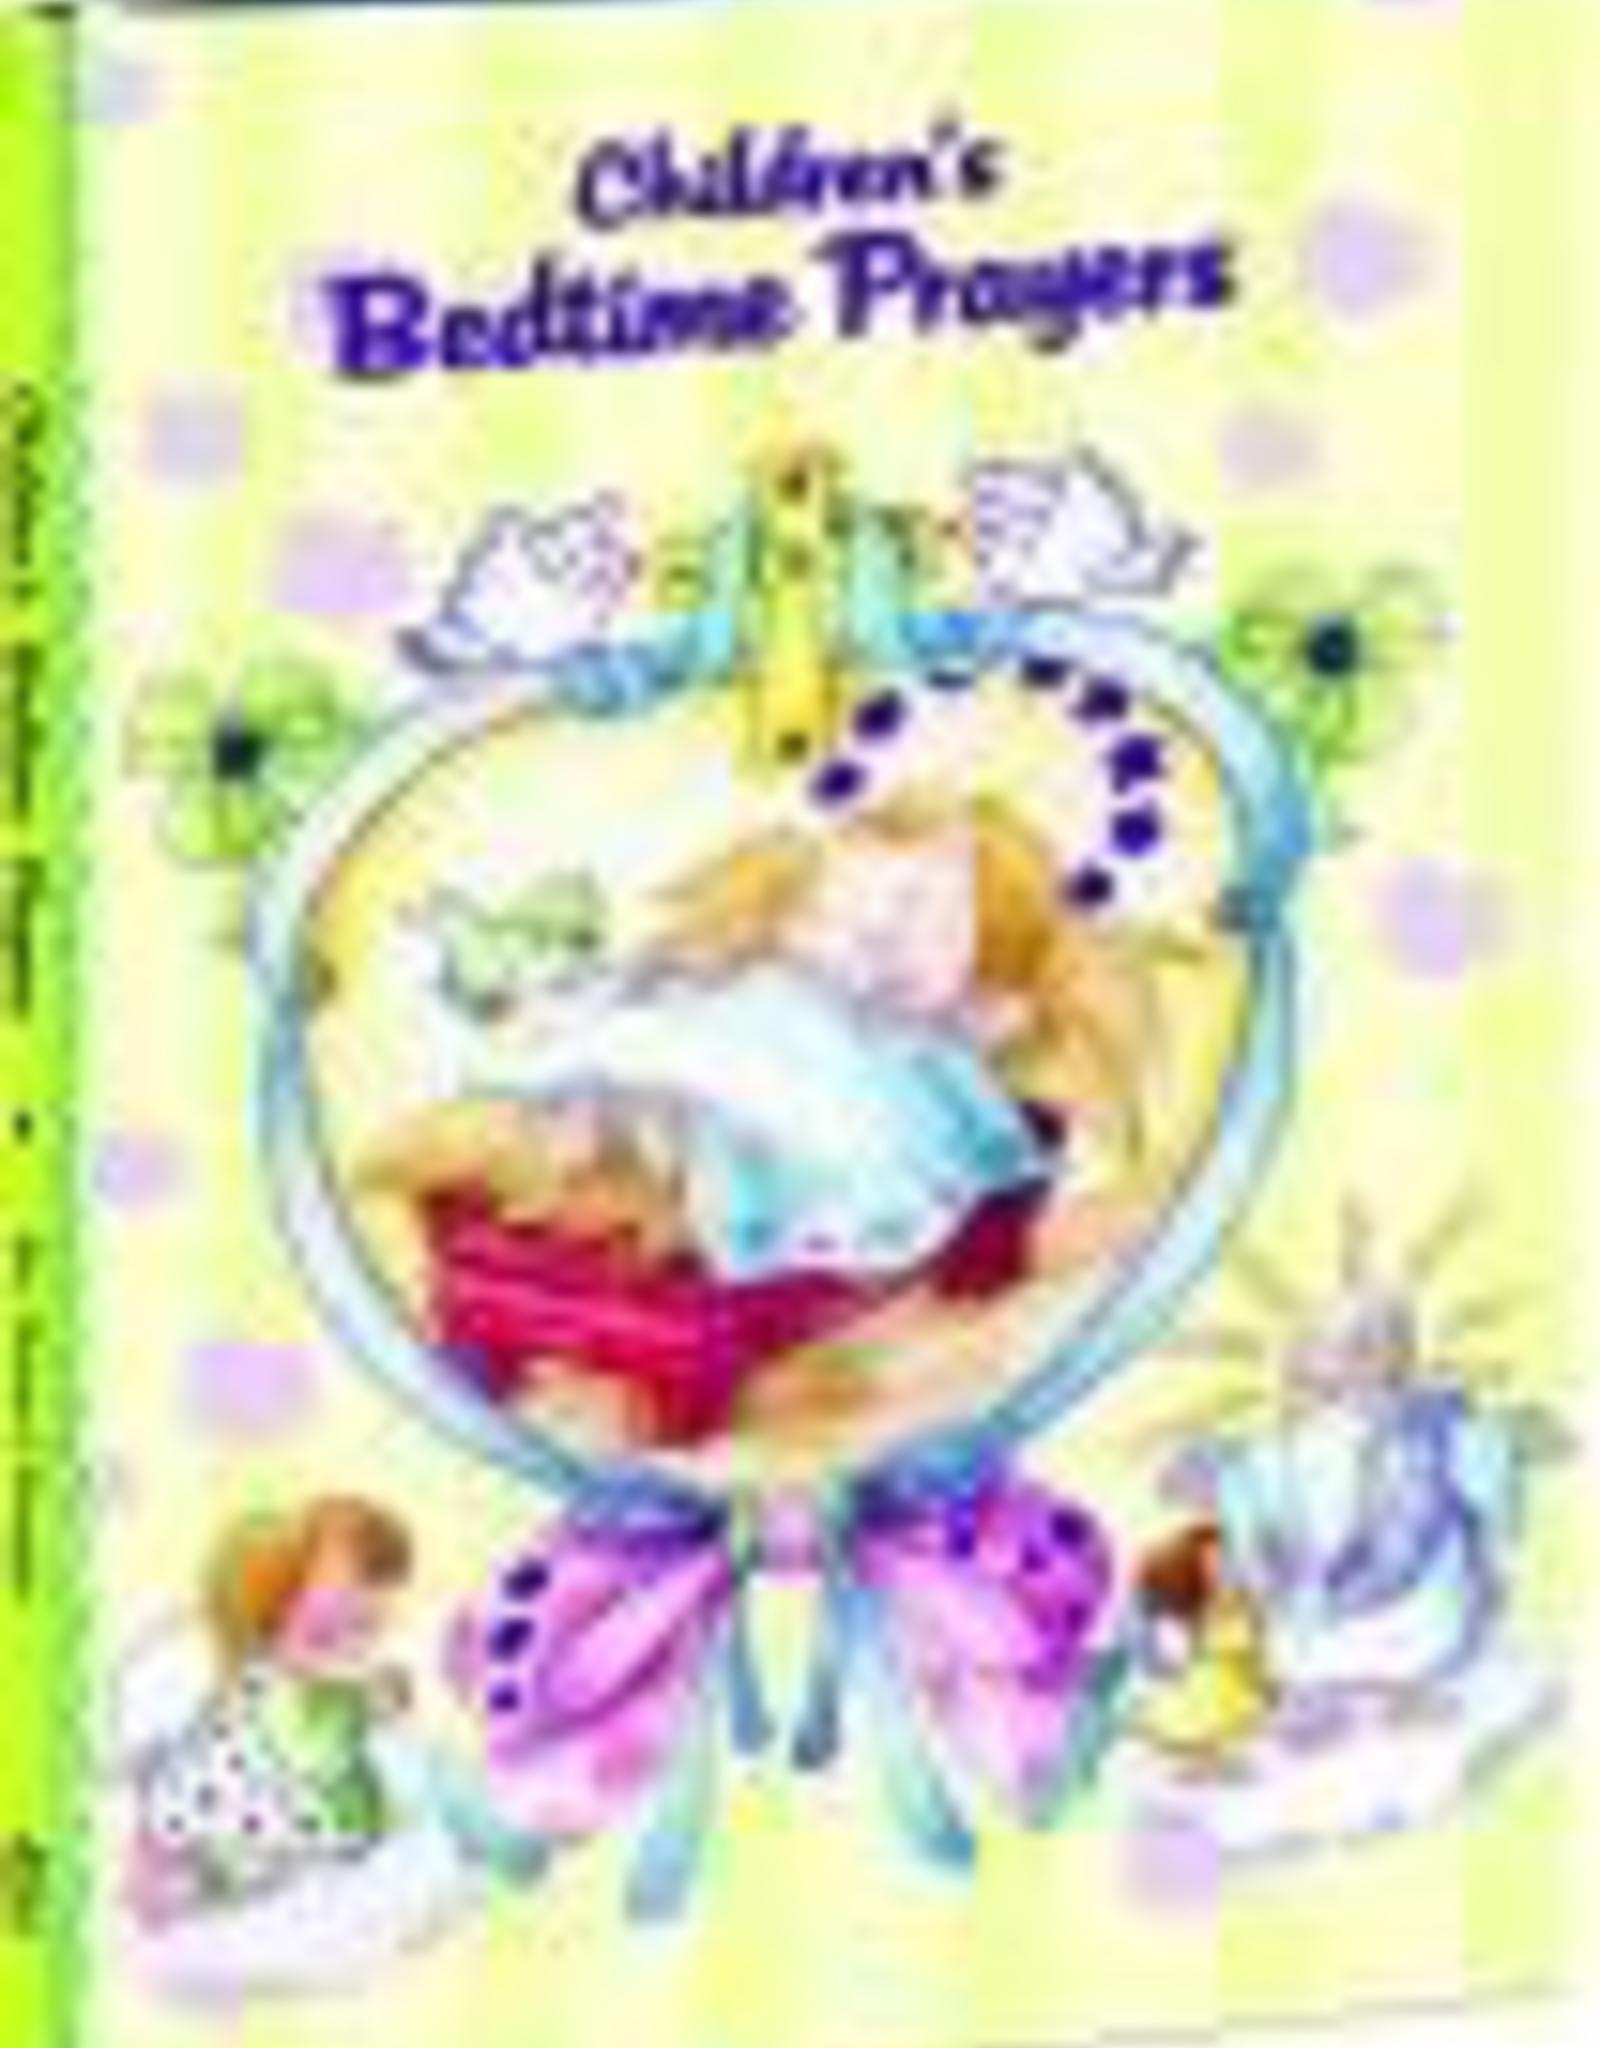 Catholic Book Publishing Children's Bedtime Prayers, by Thomas J. Donaghy (padded)